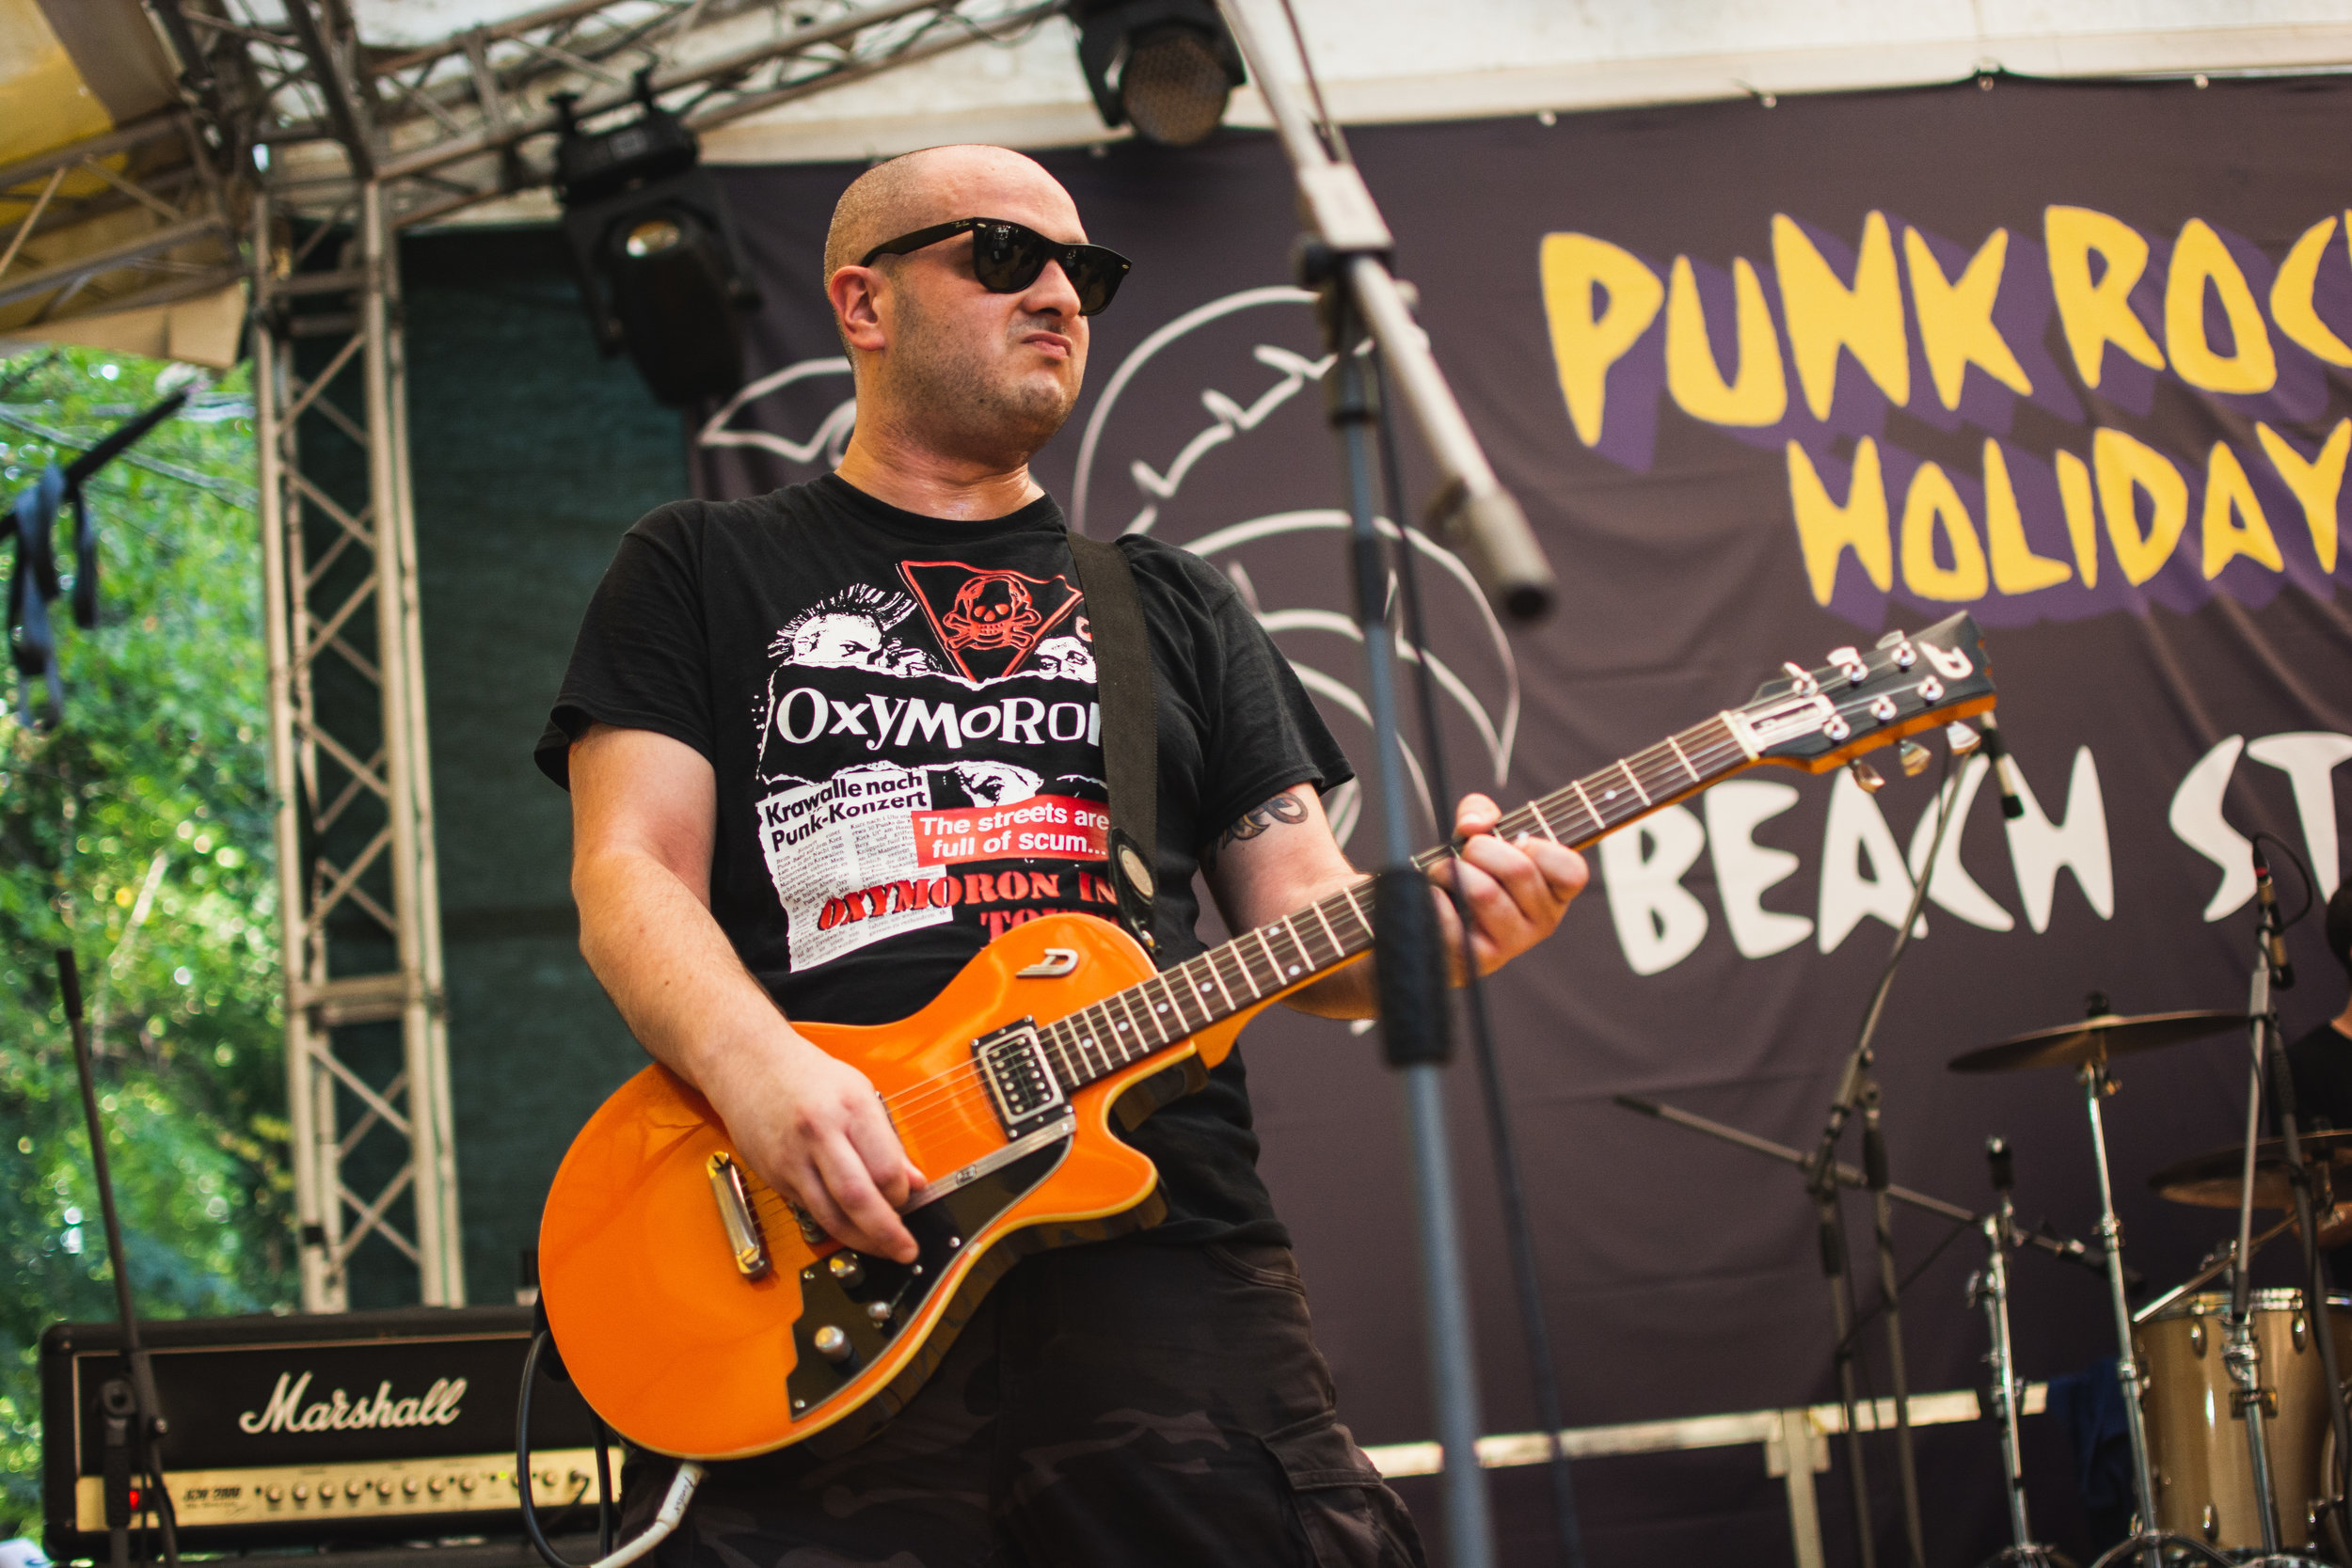 Punk-Rock-Holiday-Thursday_3_2018August 09, 2018.jpg